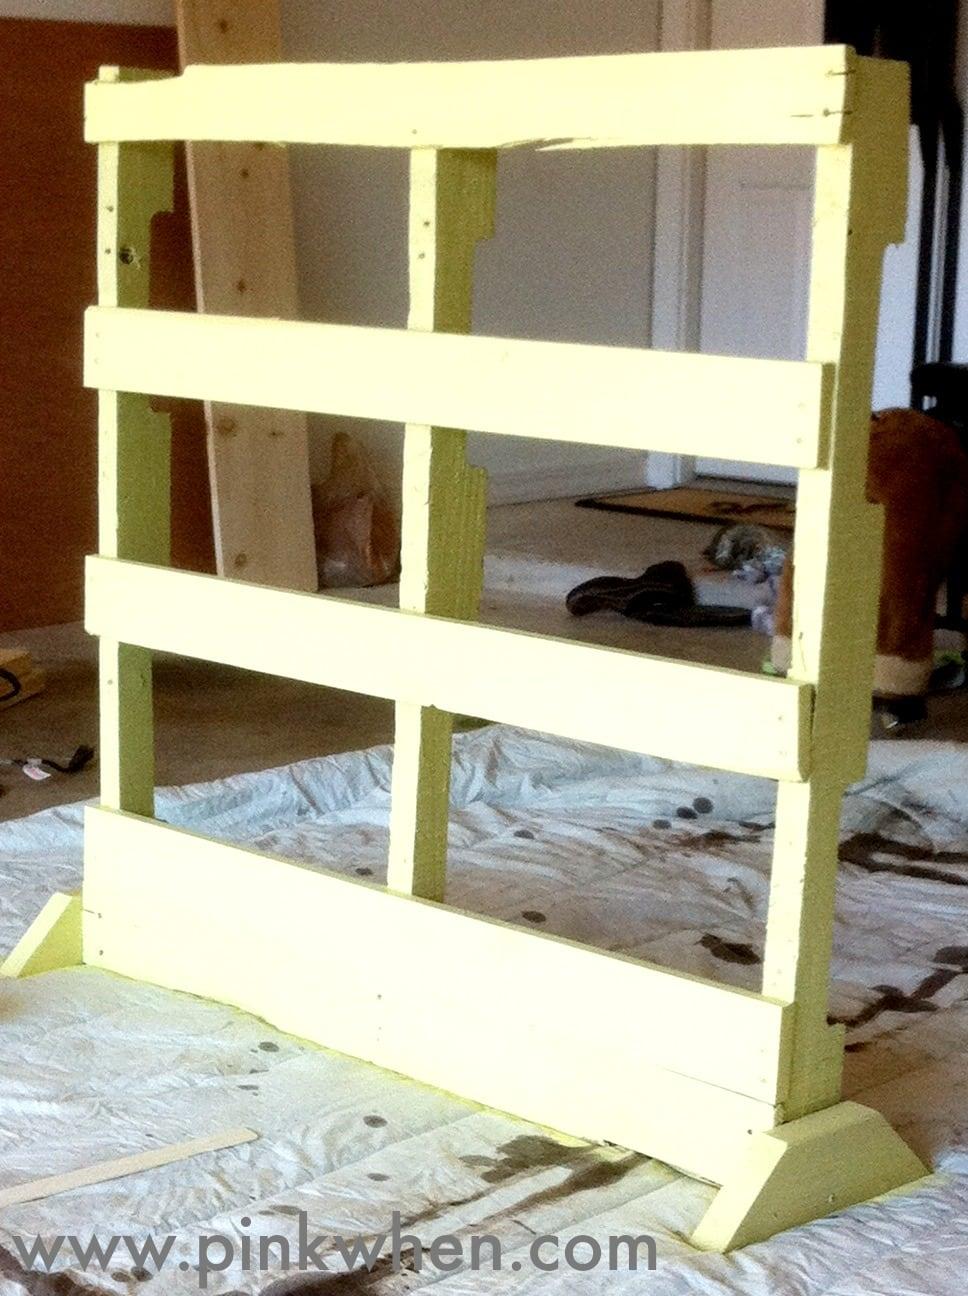 creating a vertical pallet herb garden pinkwhen. Black Bedroom Furniture Sets. Home Design Ideas